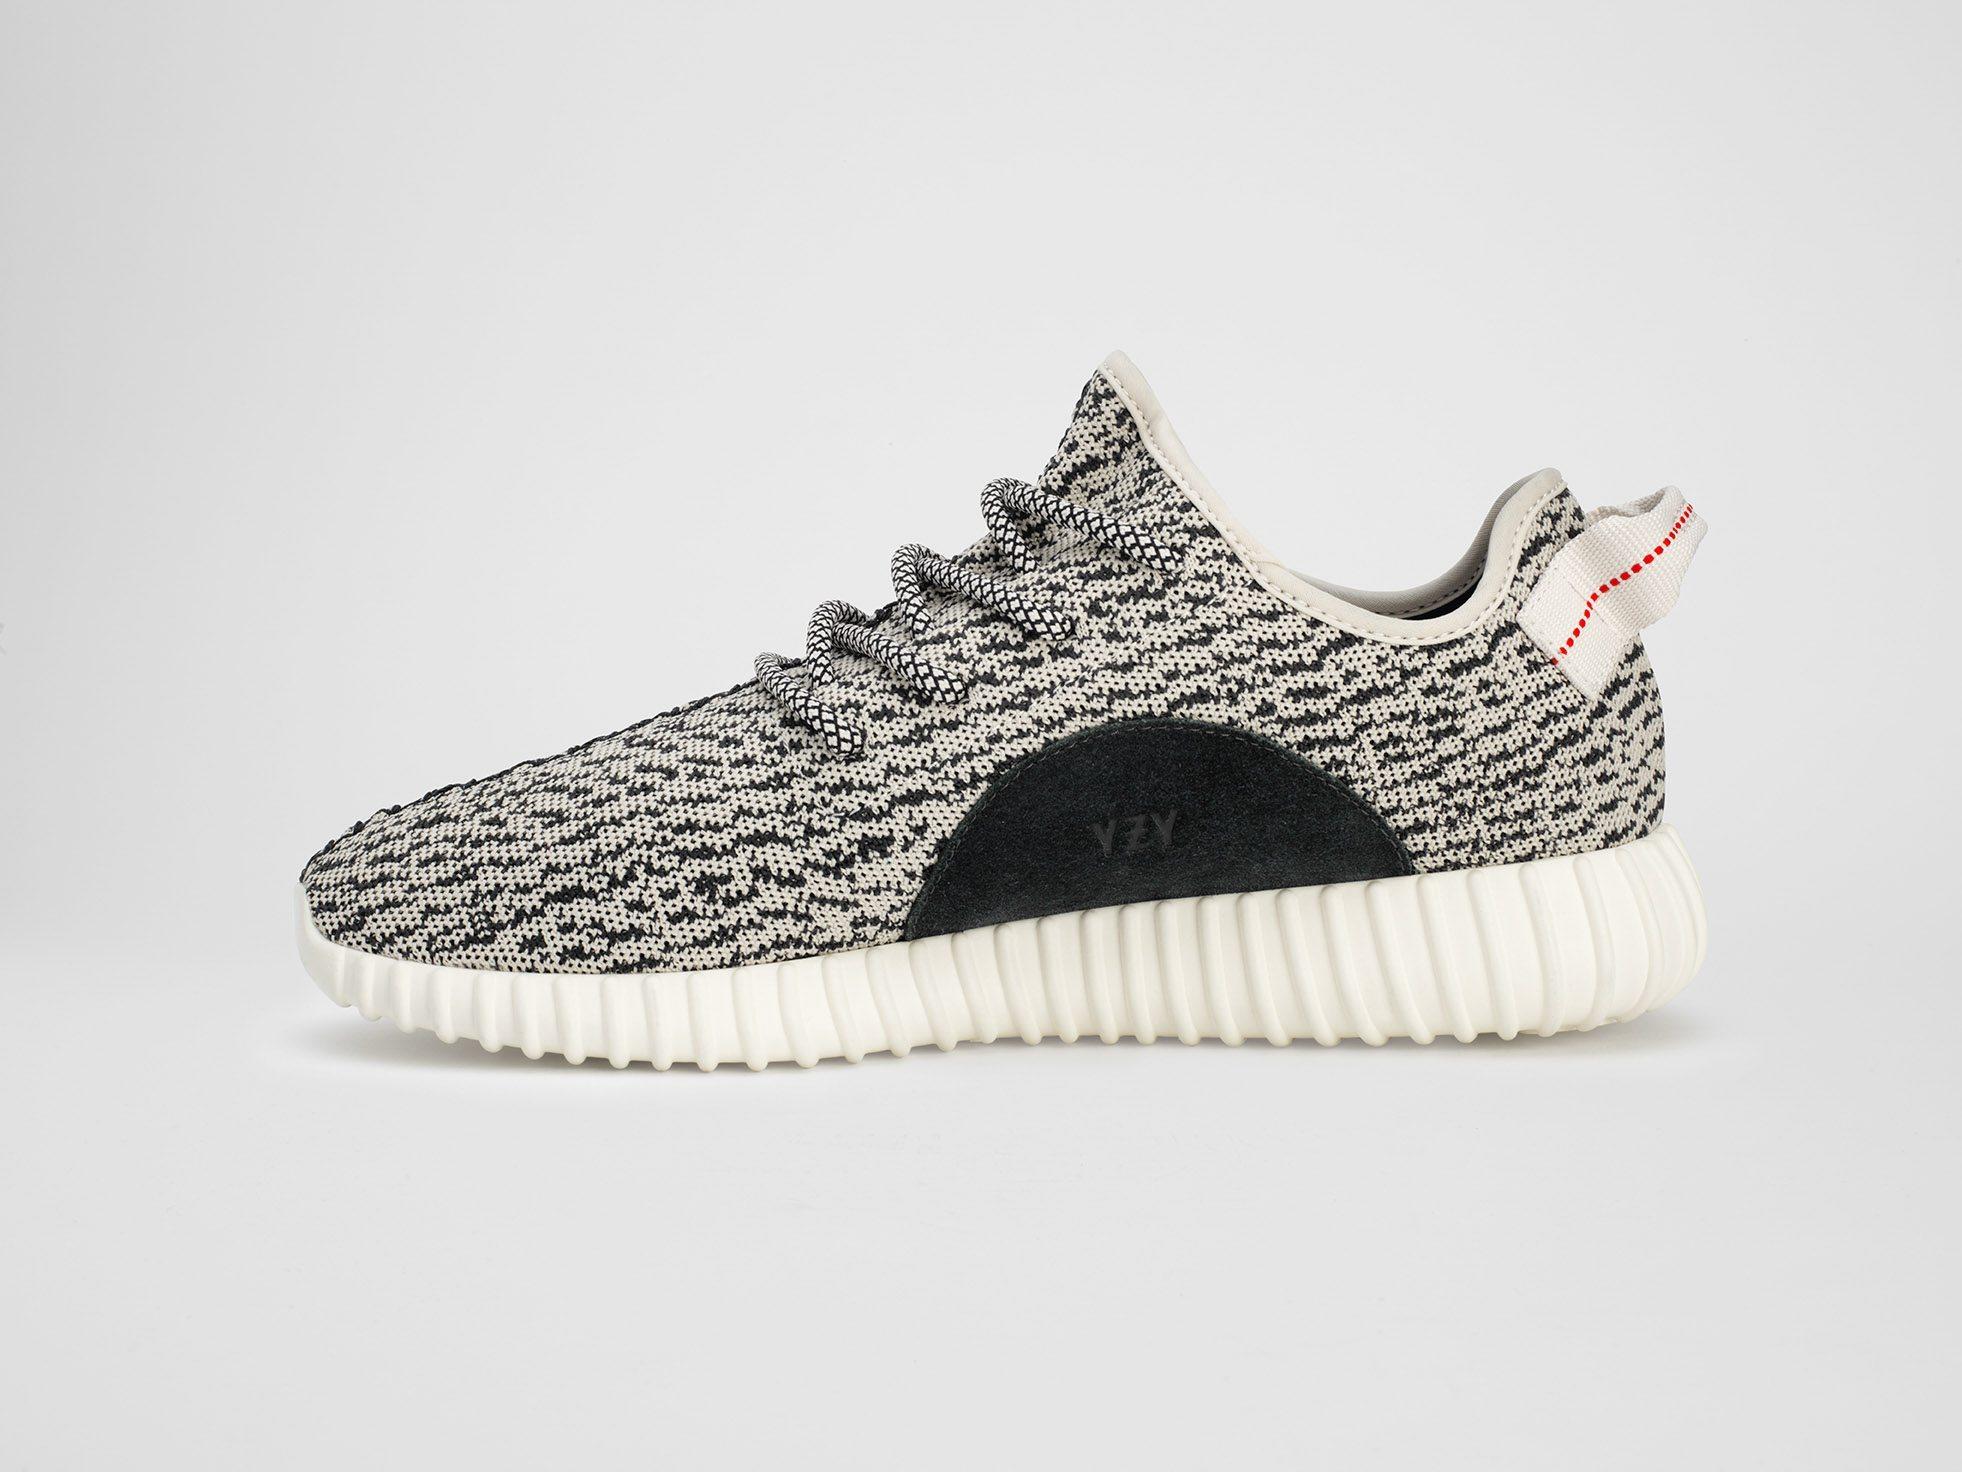 Kanye West x adidas Originals Yeezy Boost 350 2